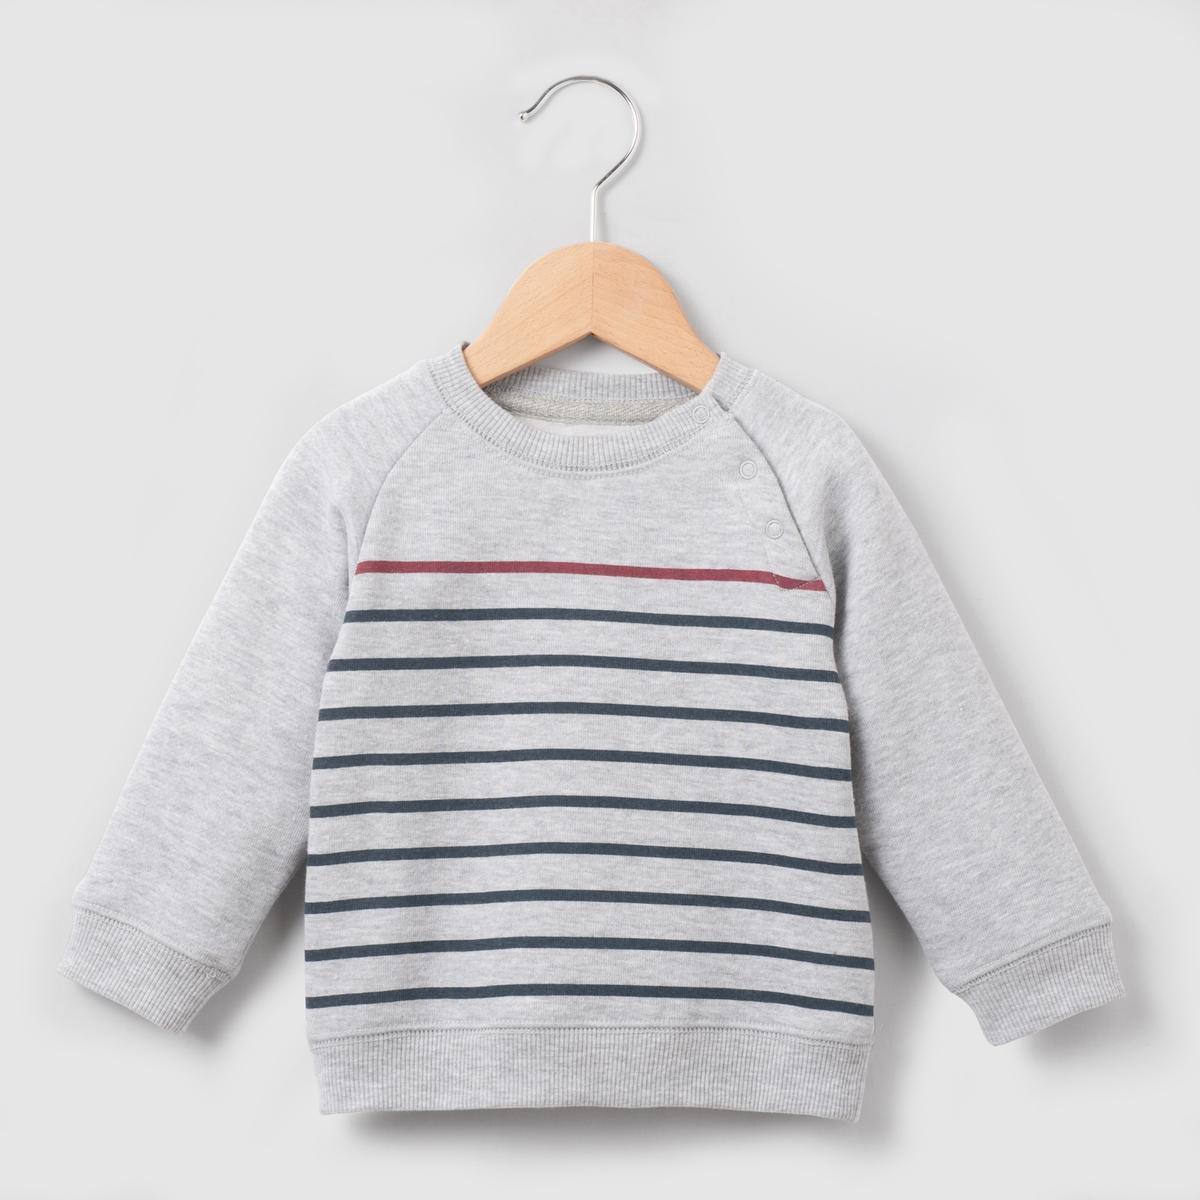 Пуловер в полоску, 1 мес. - 3 года от La Redoute Collections